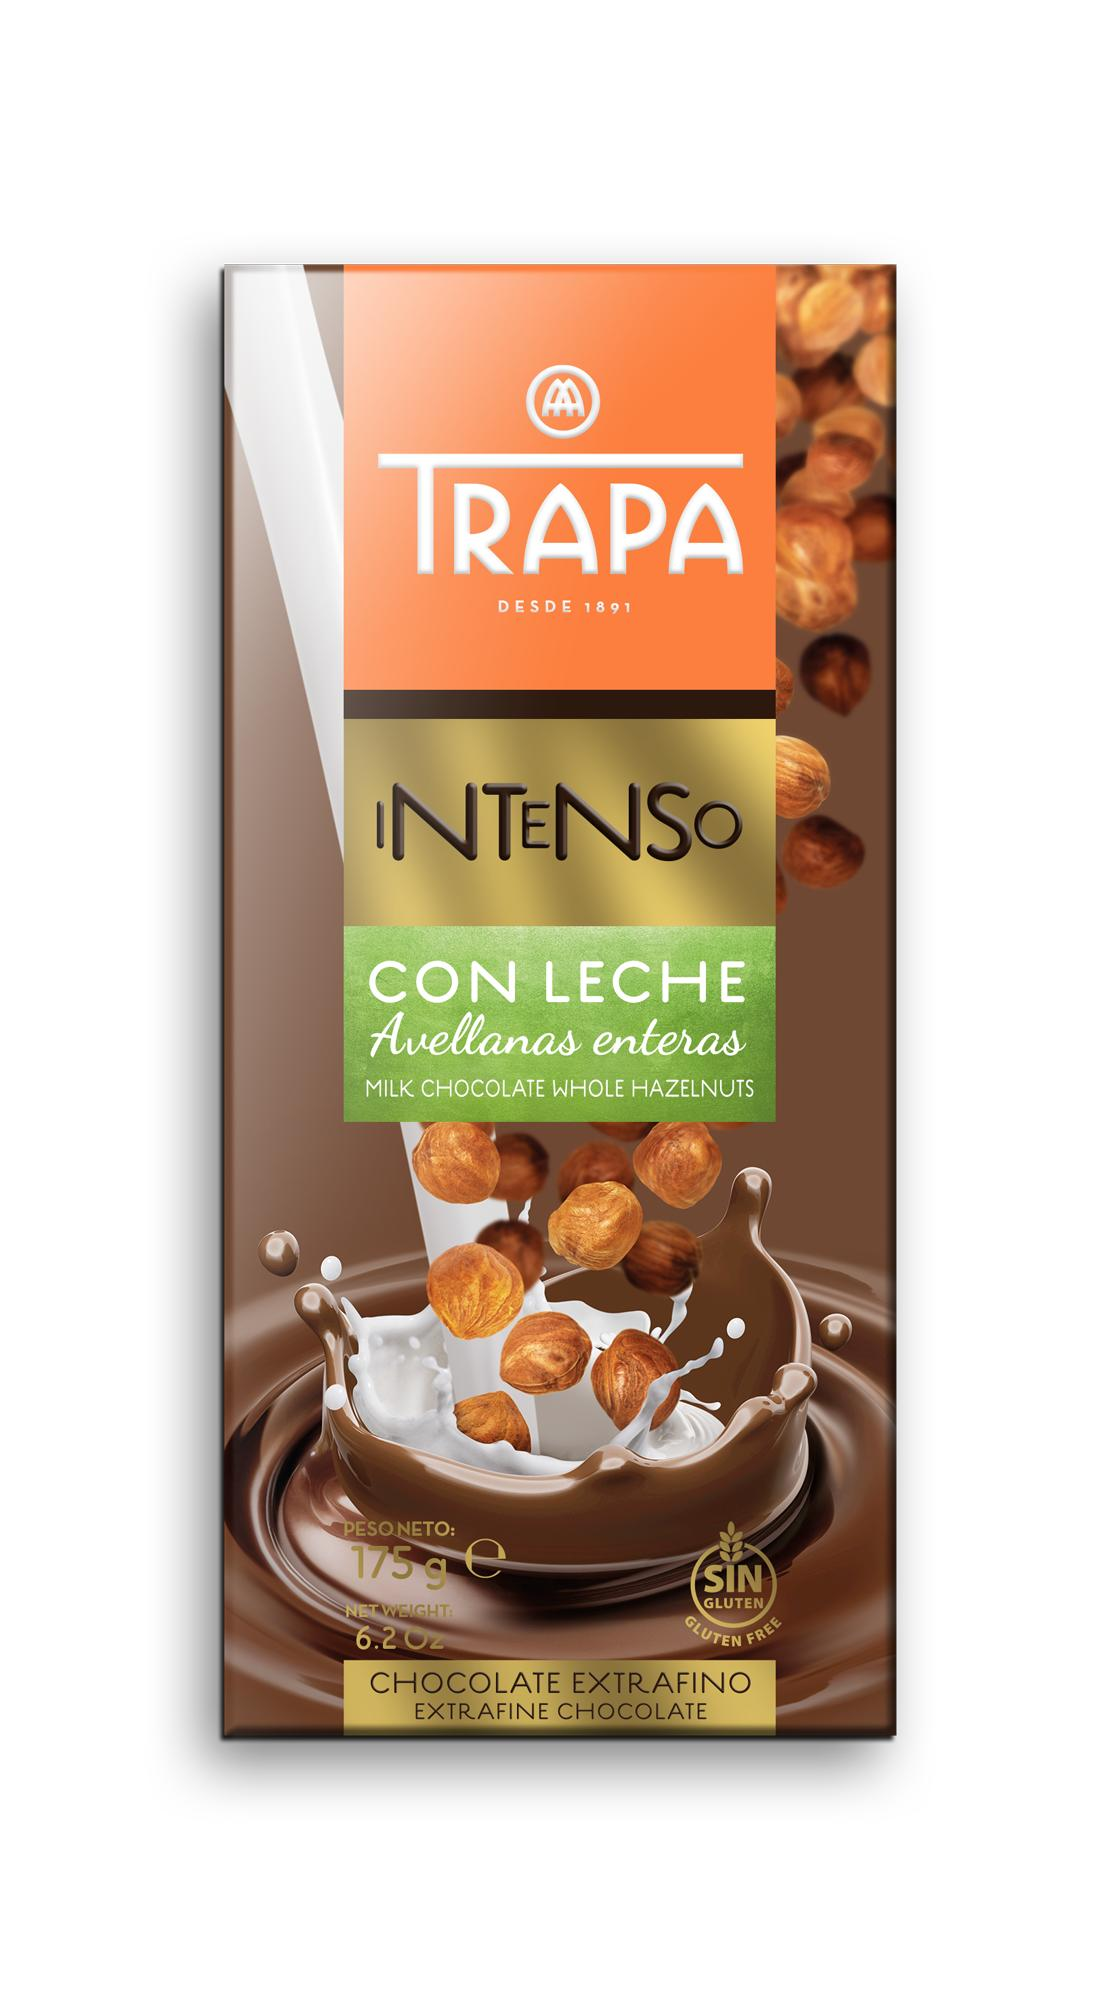 Шоколад TRAPA Intenso Con Leche молочный шоколад с фундуком